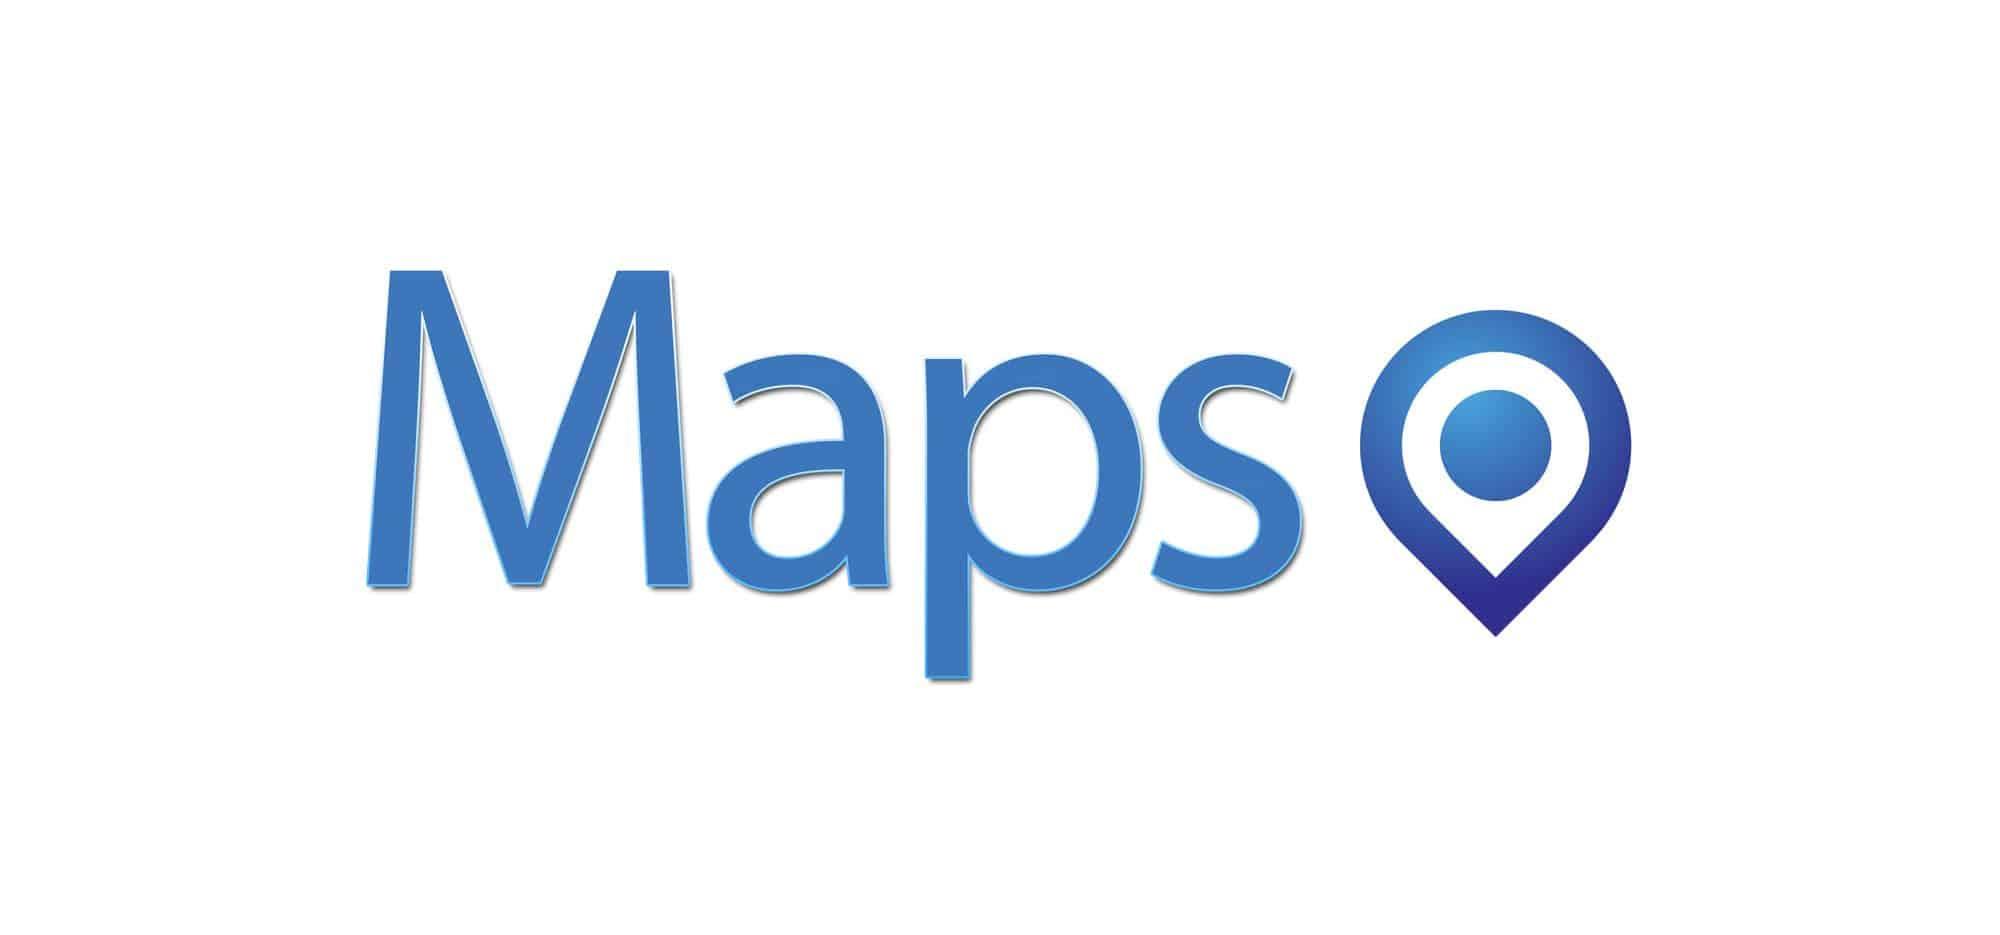 google maps seo in new orleans - Big Easy SEO